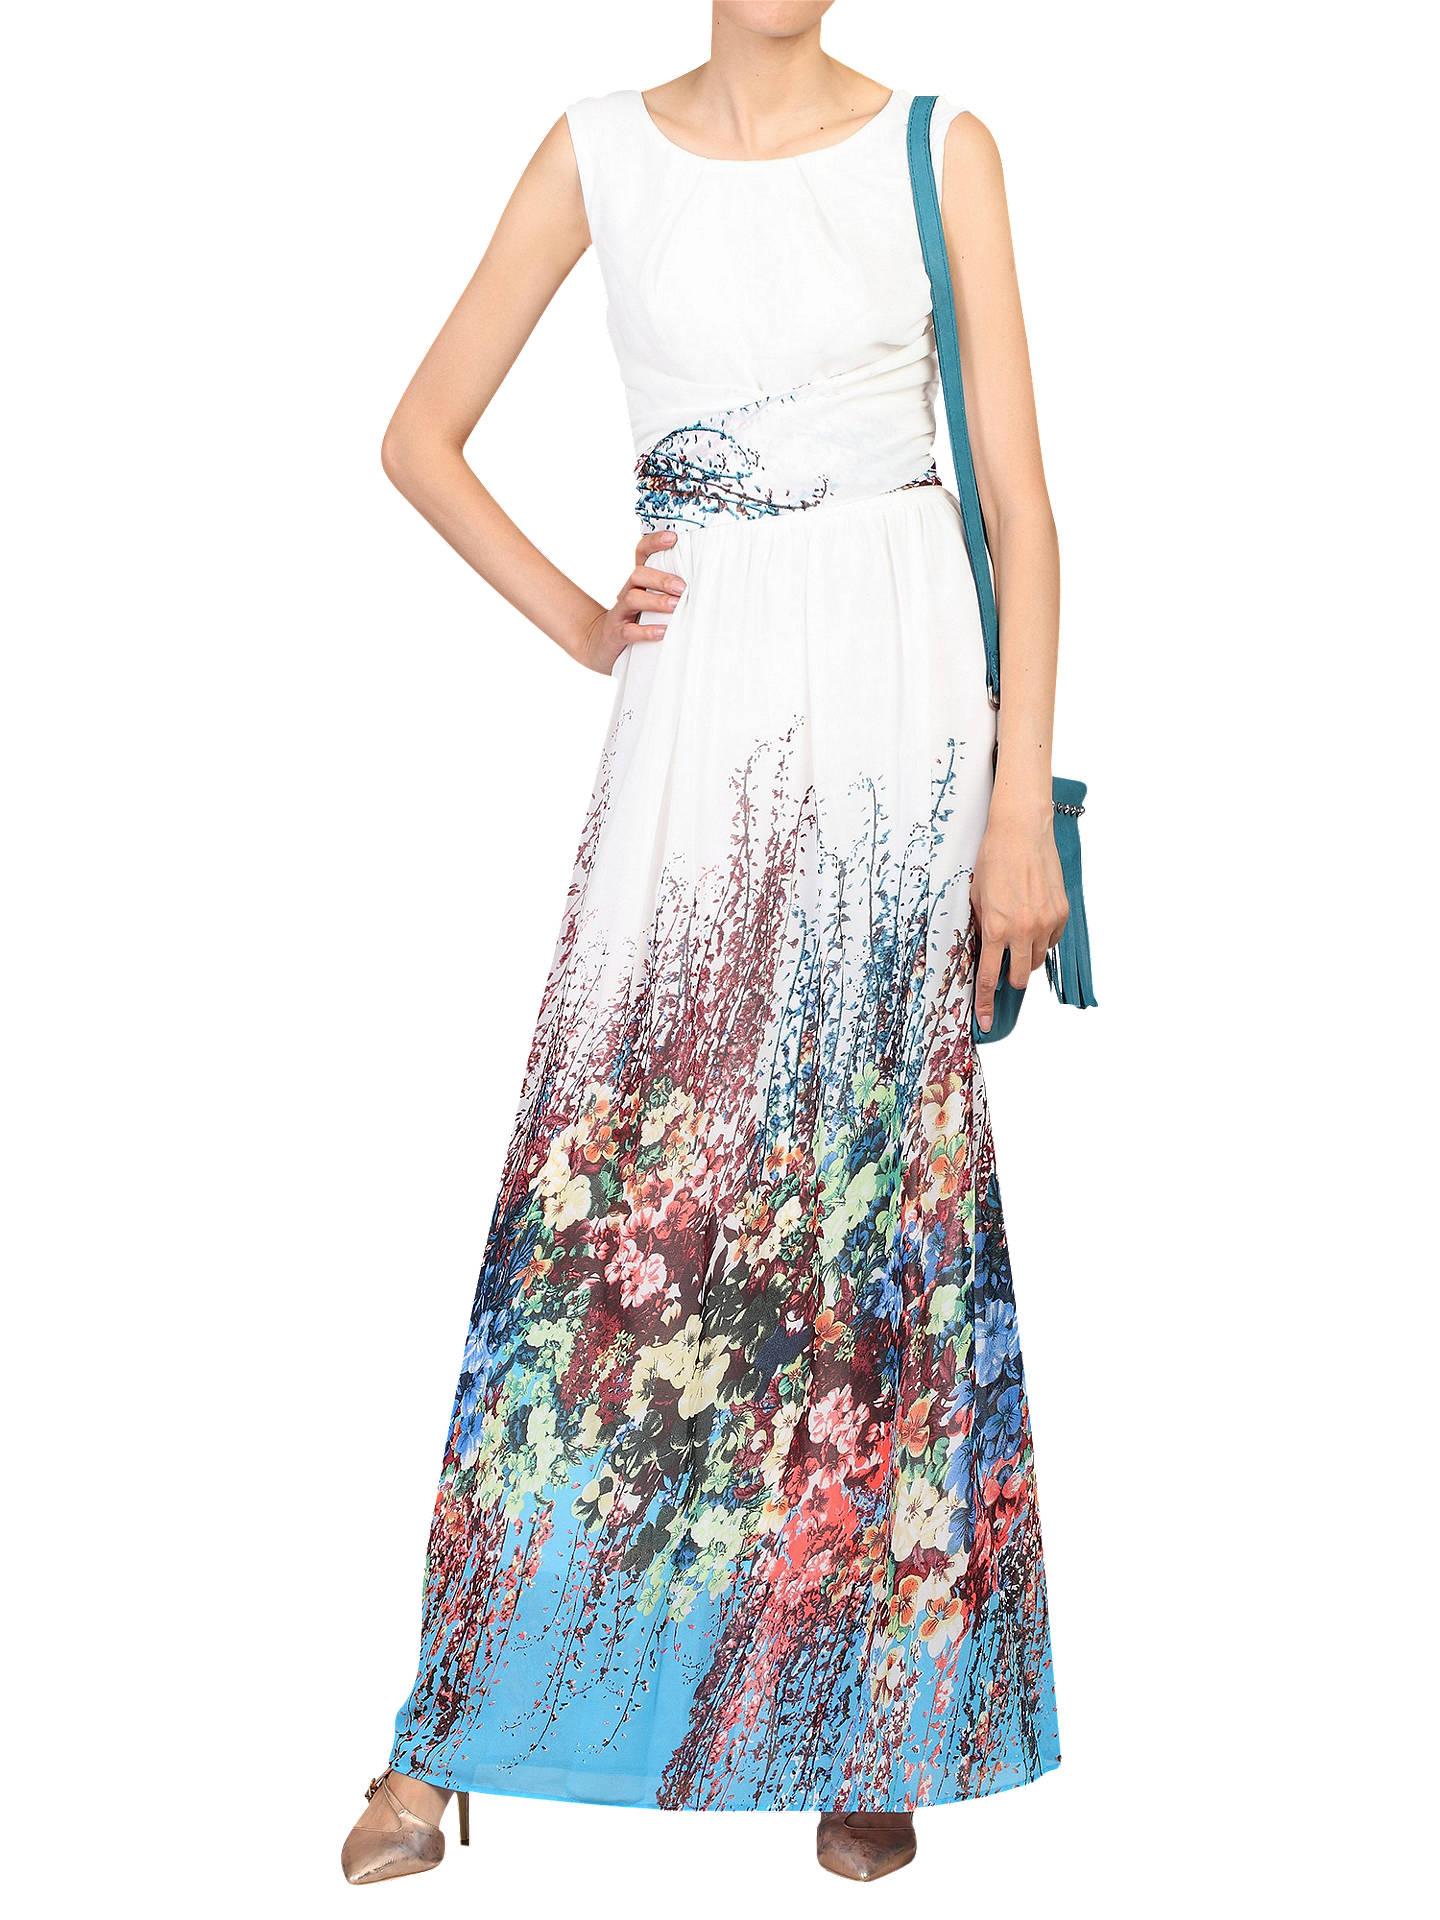 7ee93b8f1b3 Buy Jolie Moi Floral Print Chiffon Maxi Dress